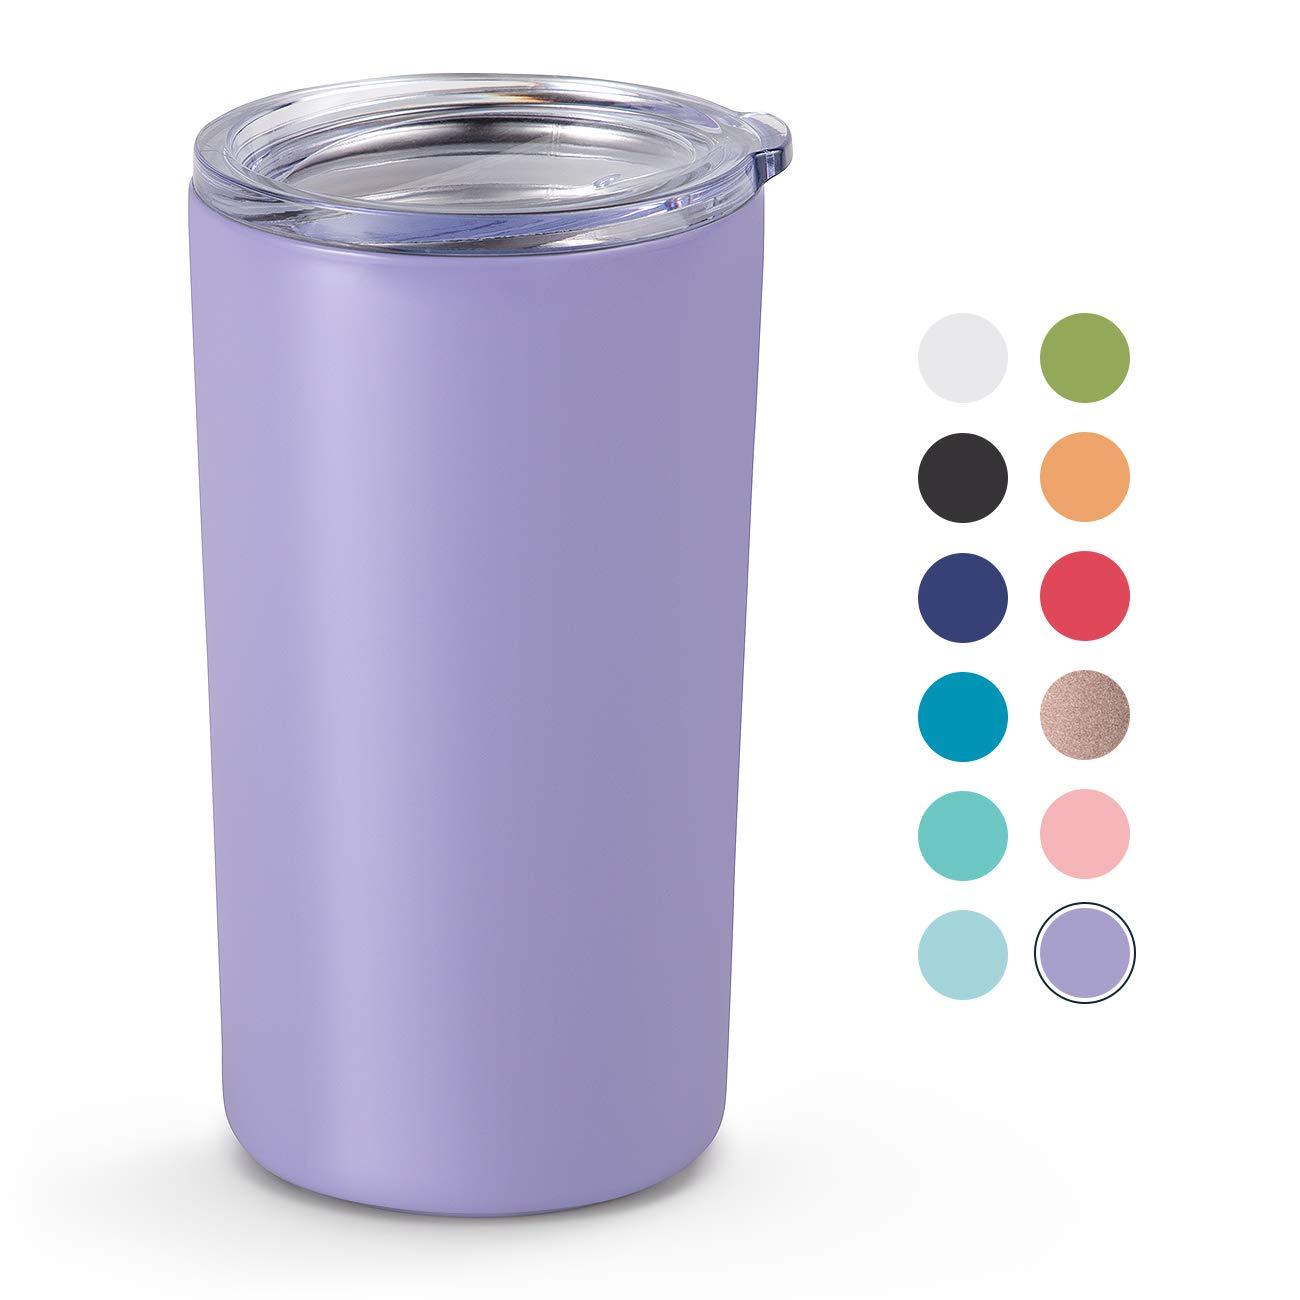 Maars Drinkware Skinny Mini Insulated Tumbler for Coffee and Tea, 1 Pack, Lavender